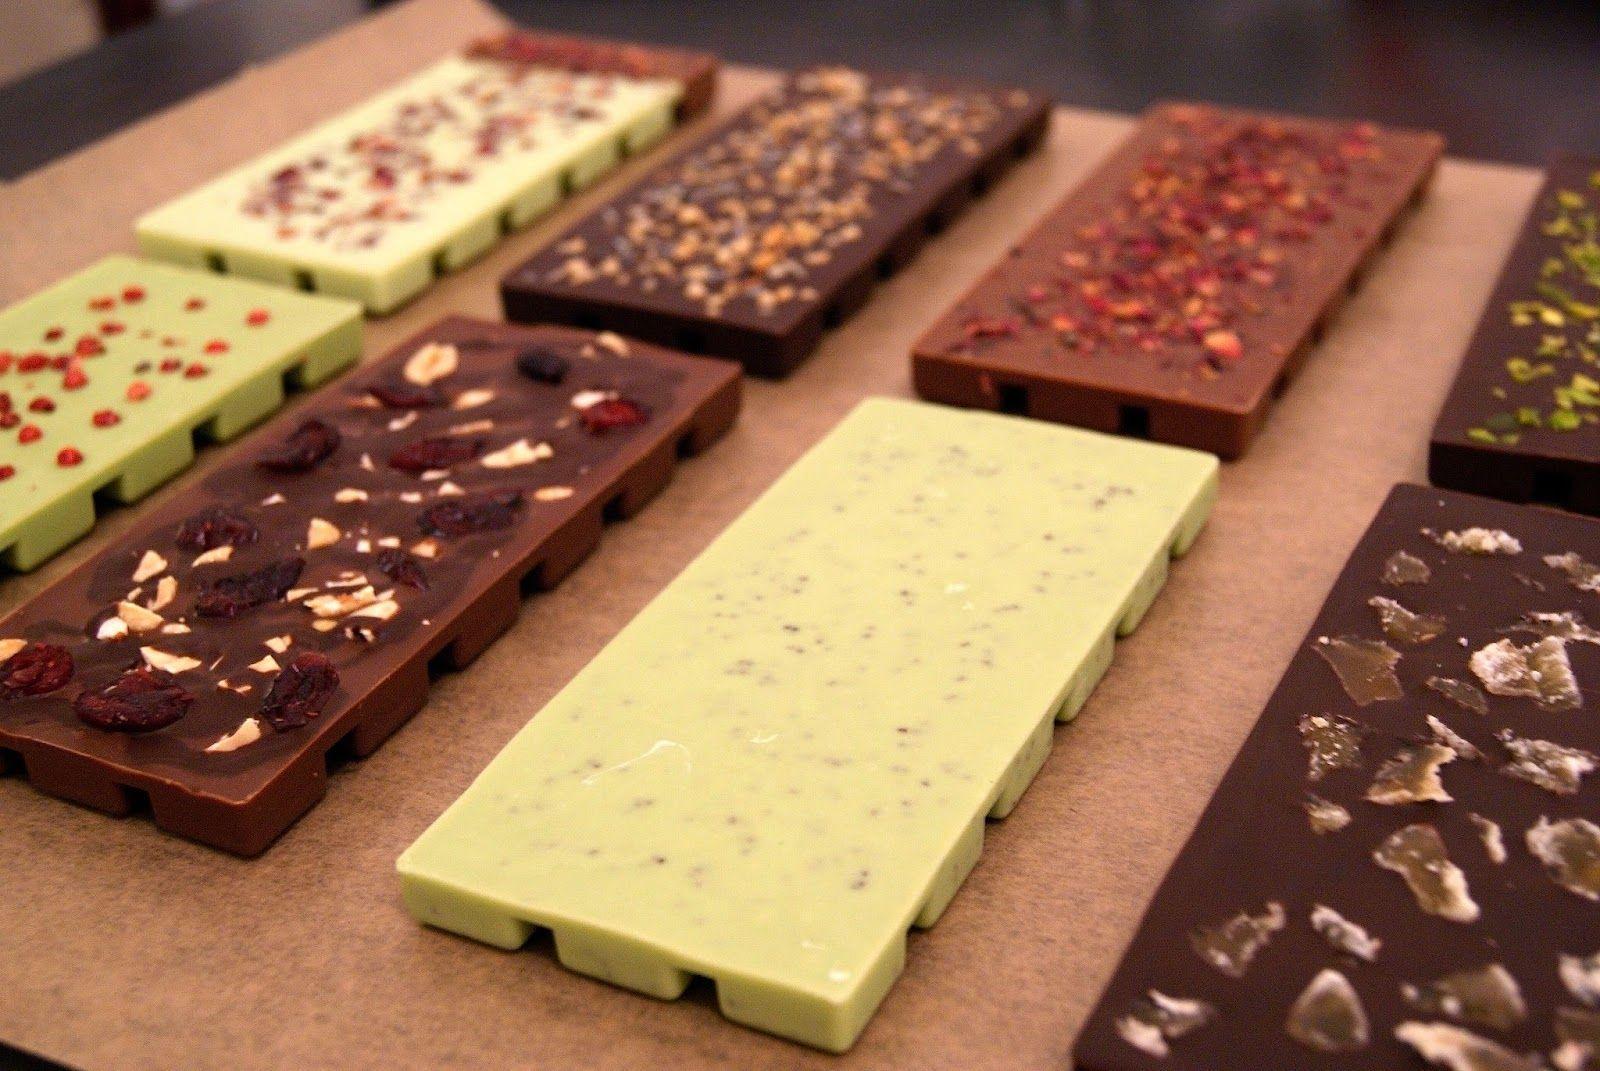 schokoladetafel selber machen bake time pinterest schokolade pralinen and schokoladentafel. Black Bedroom Furniture Sets. Home Design Ideas